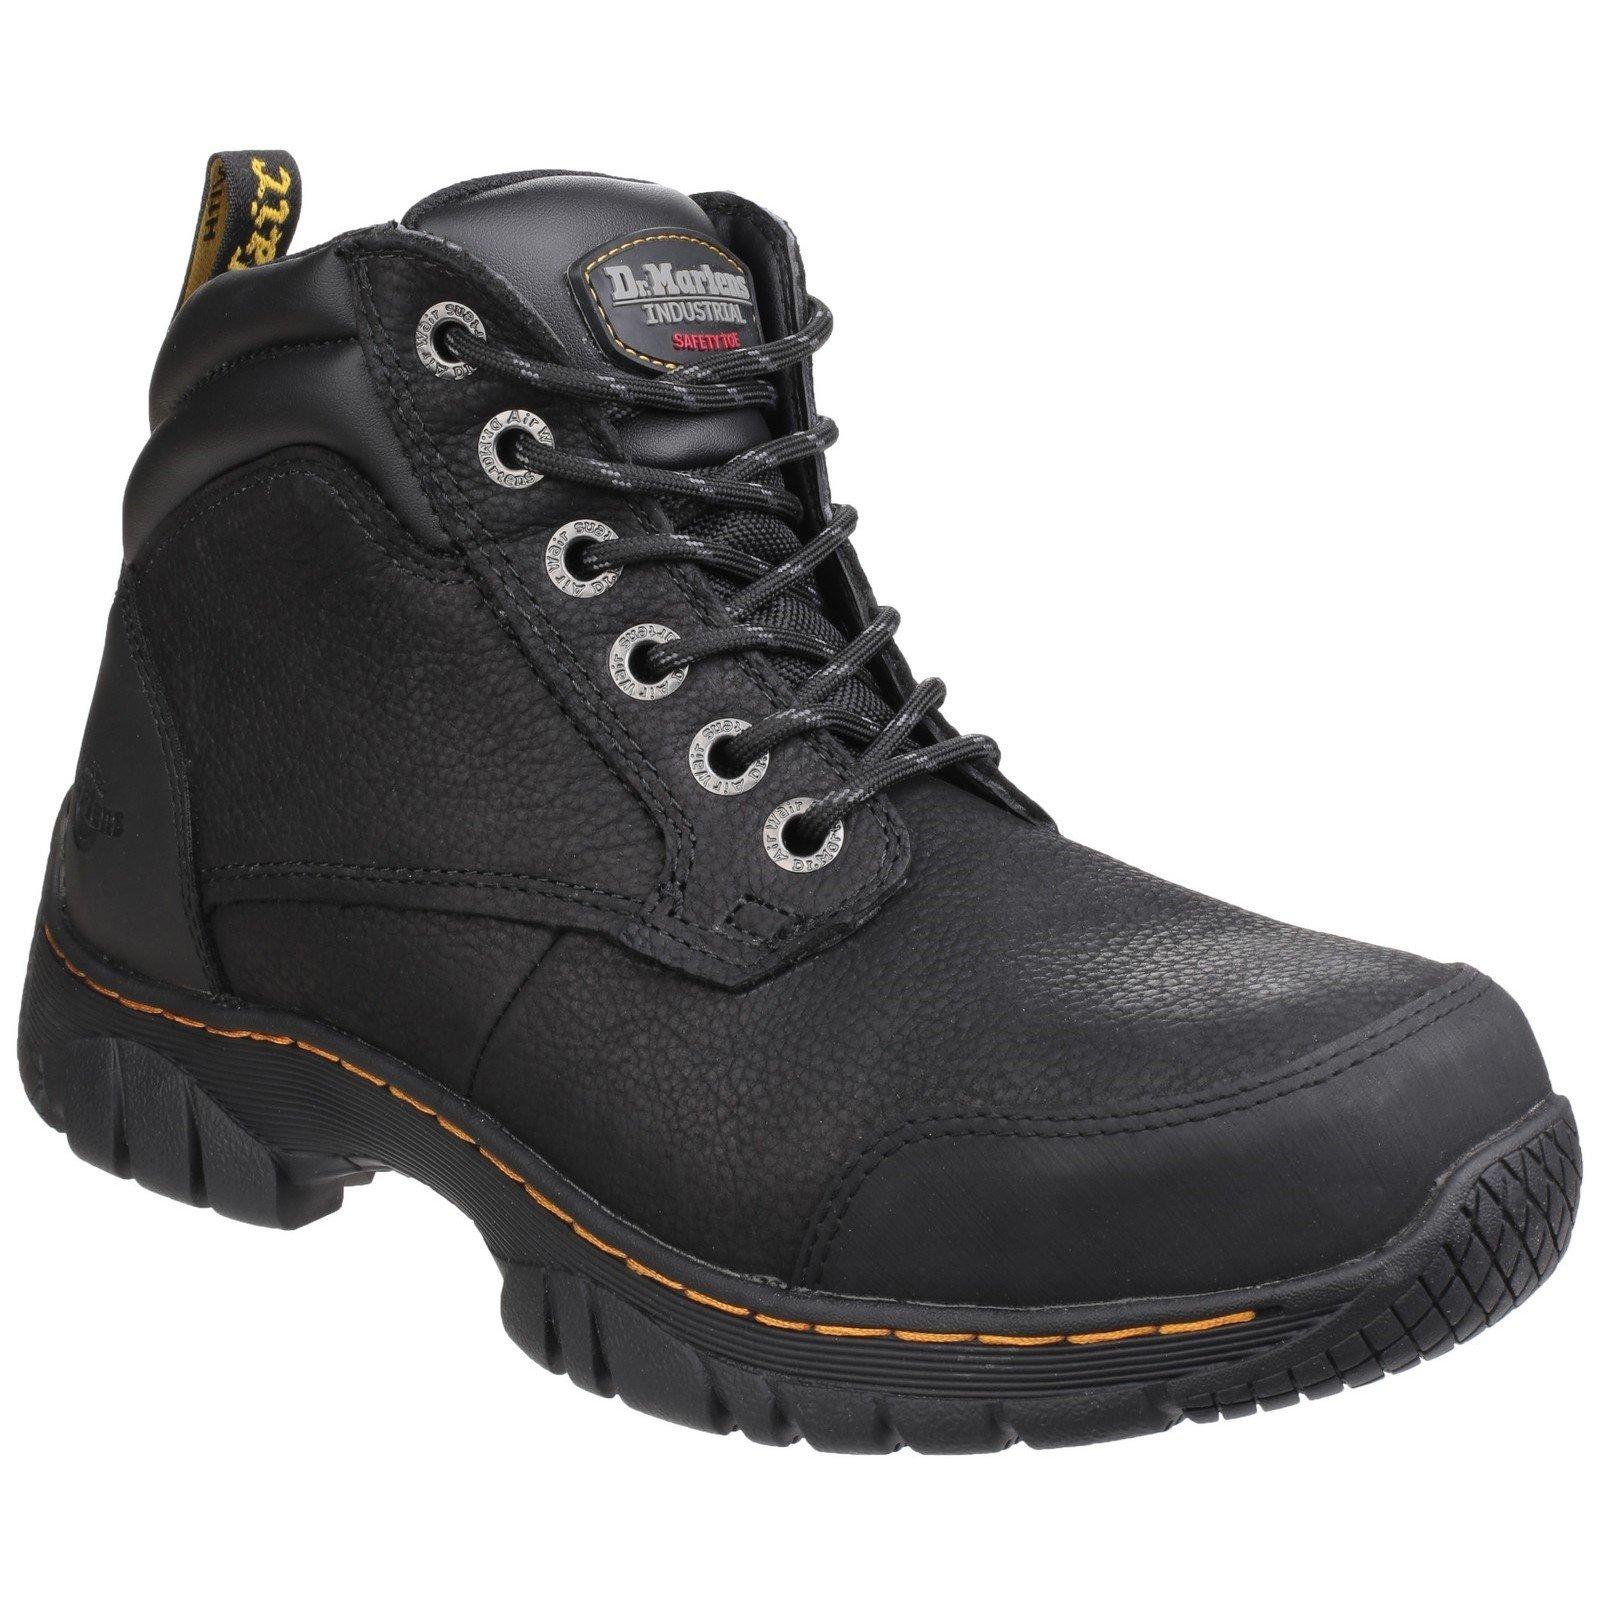 Dr Martens Unisex Riverton SB Lace up Hiker Boot Black 24533 - Black 10